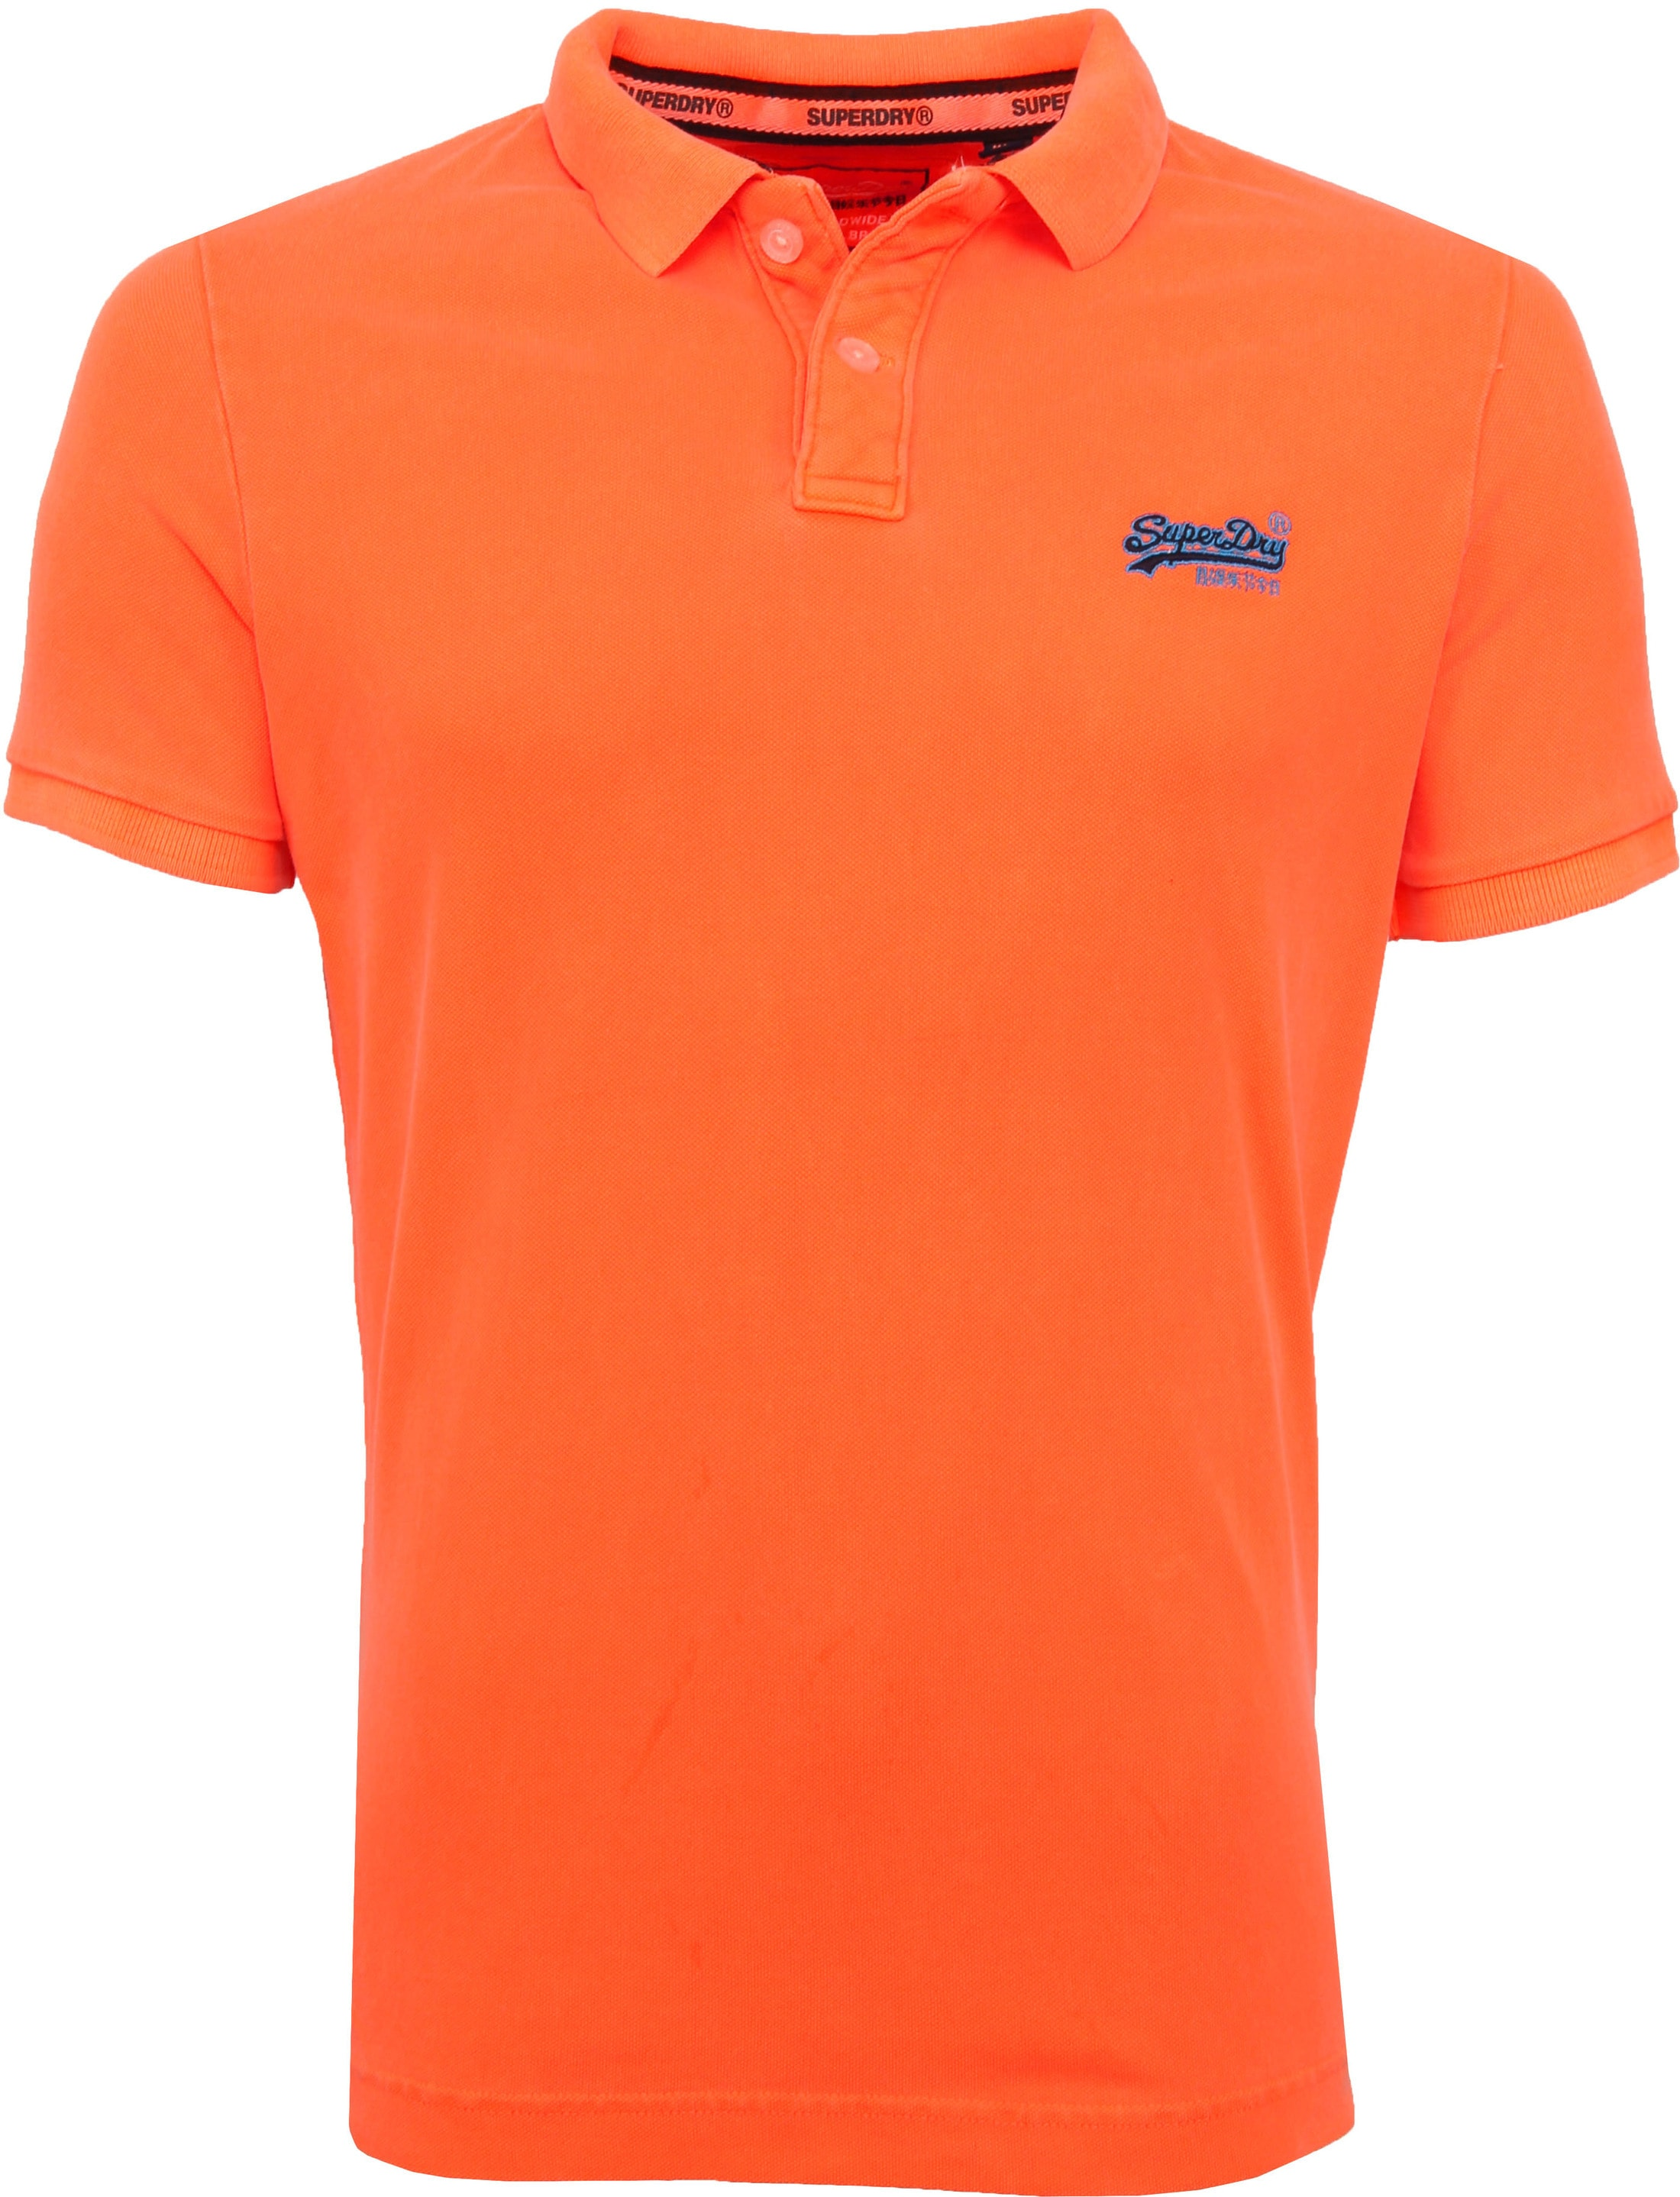 Superdry Poloshirt Fluro Orange foto 0